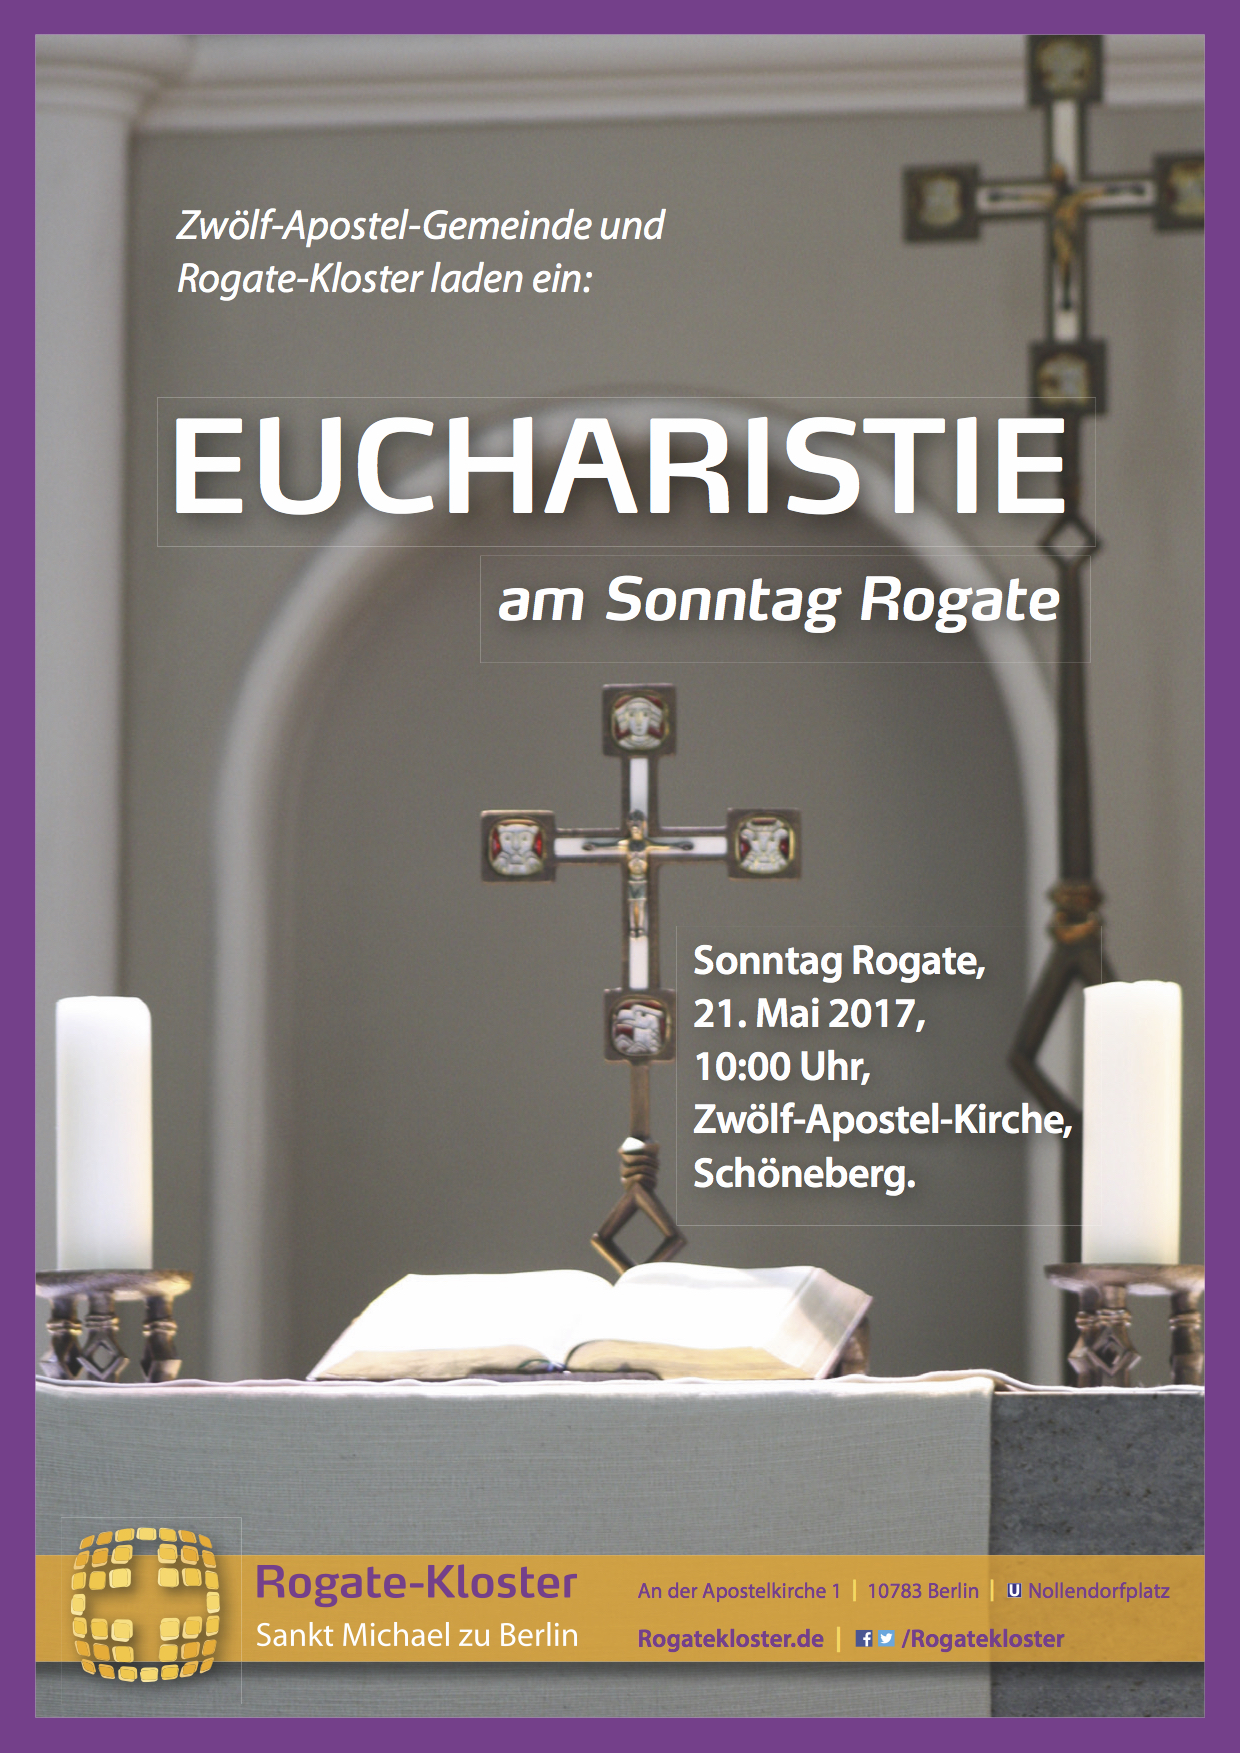 RogateKl_Aushang A4_Eucharistie RogateSo 210517_111116 Kopie.jpg